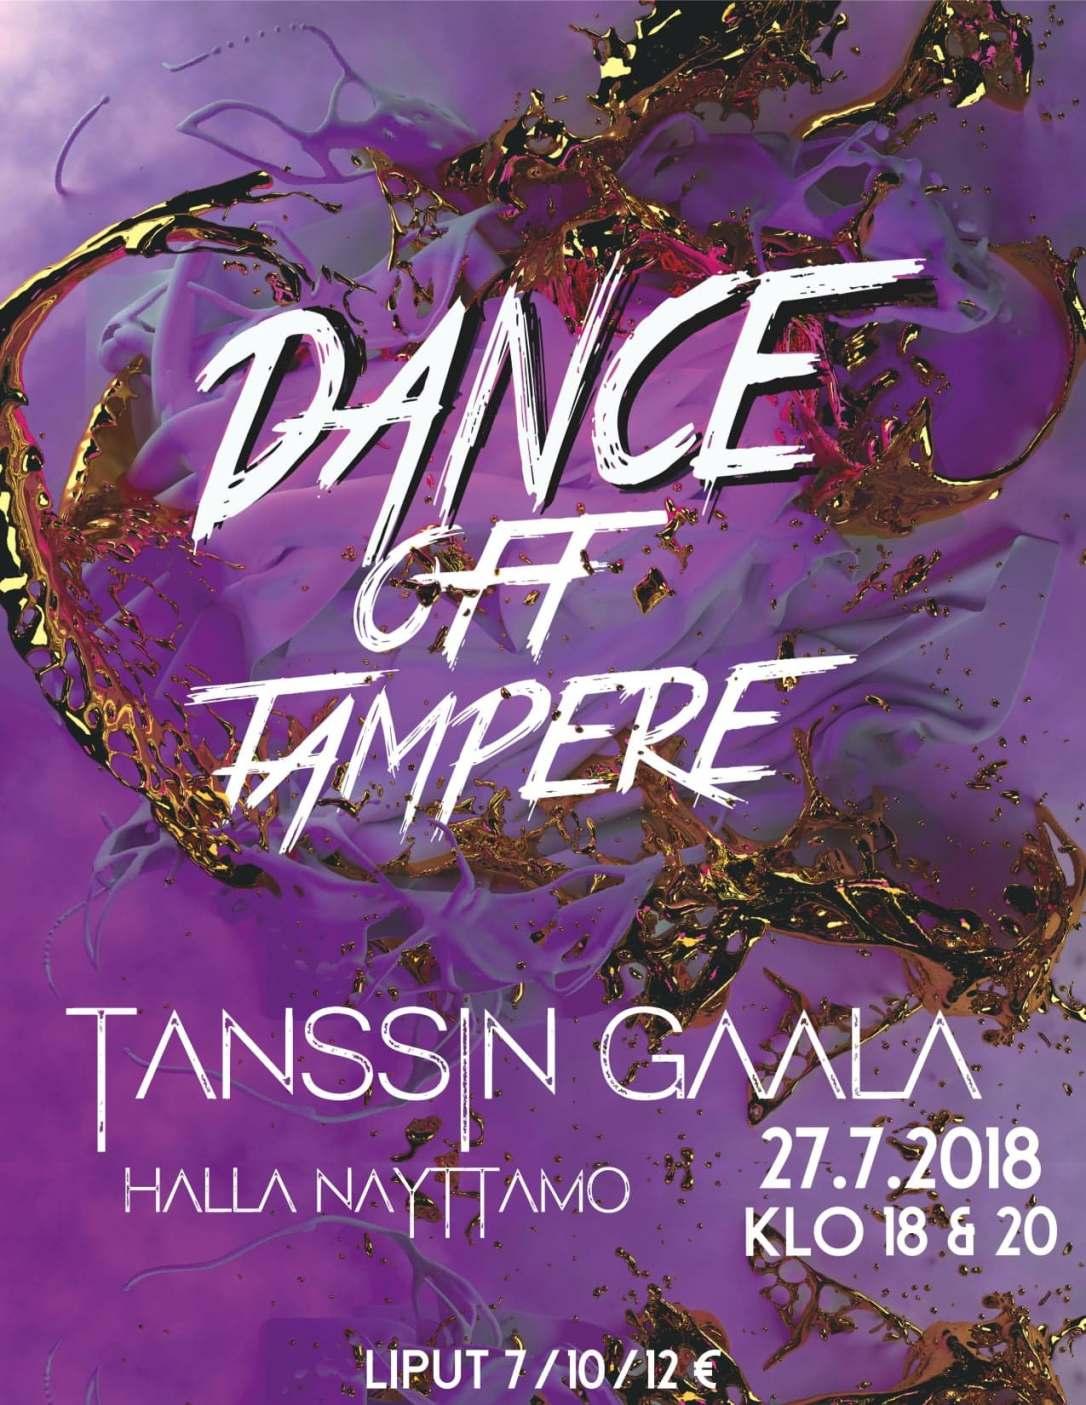 TanssinGaala